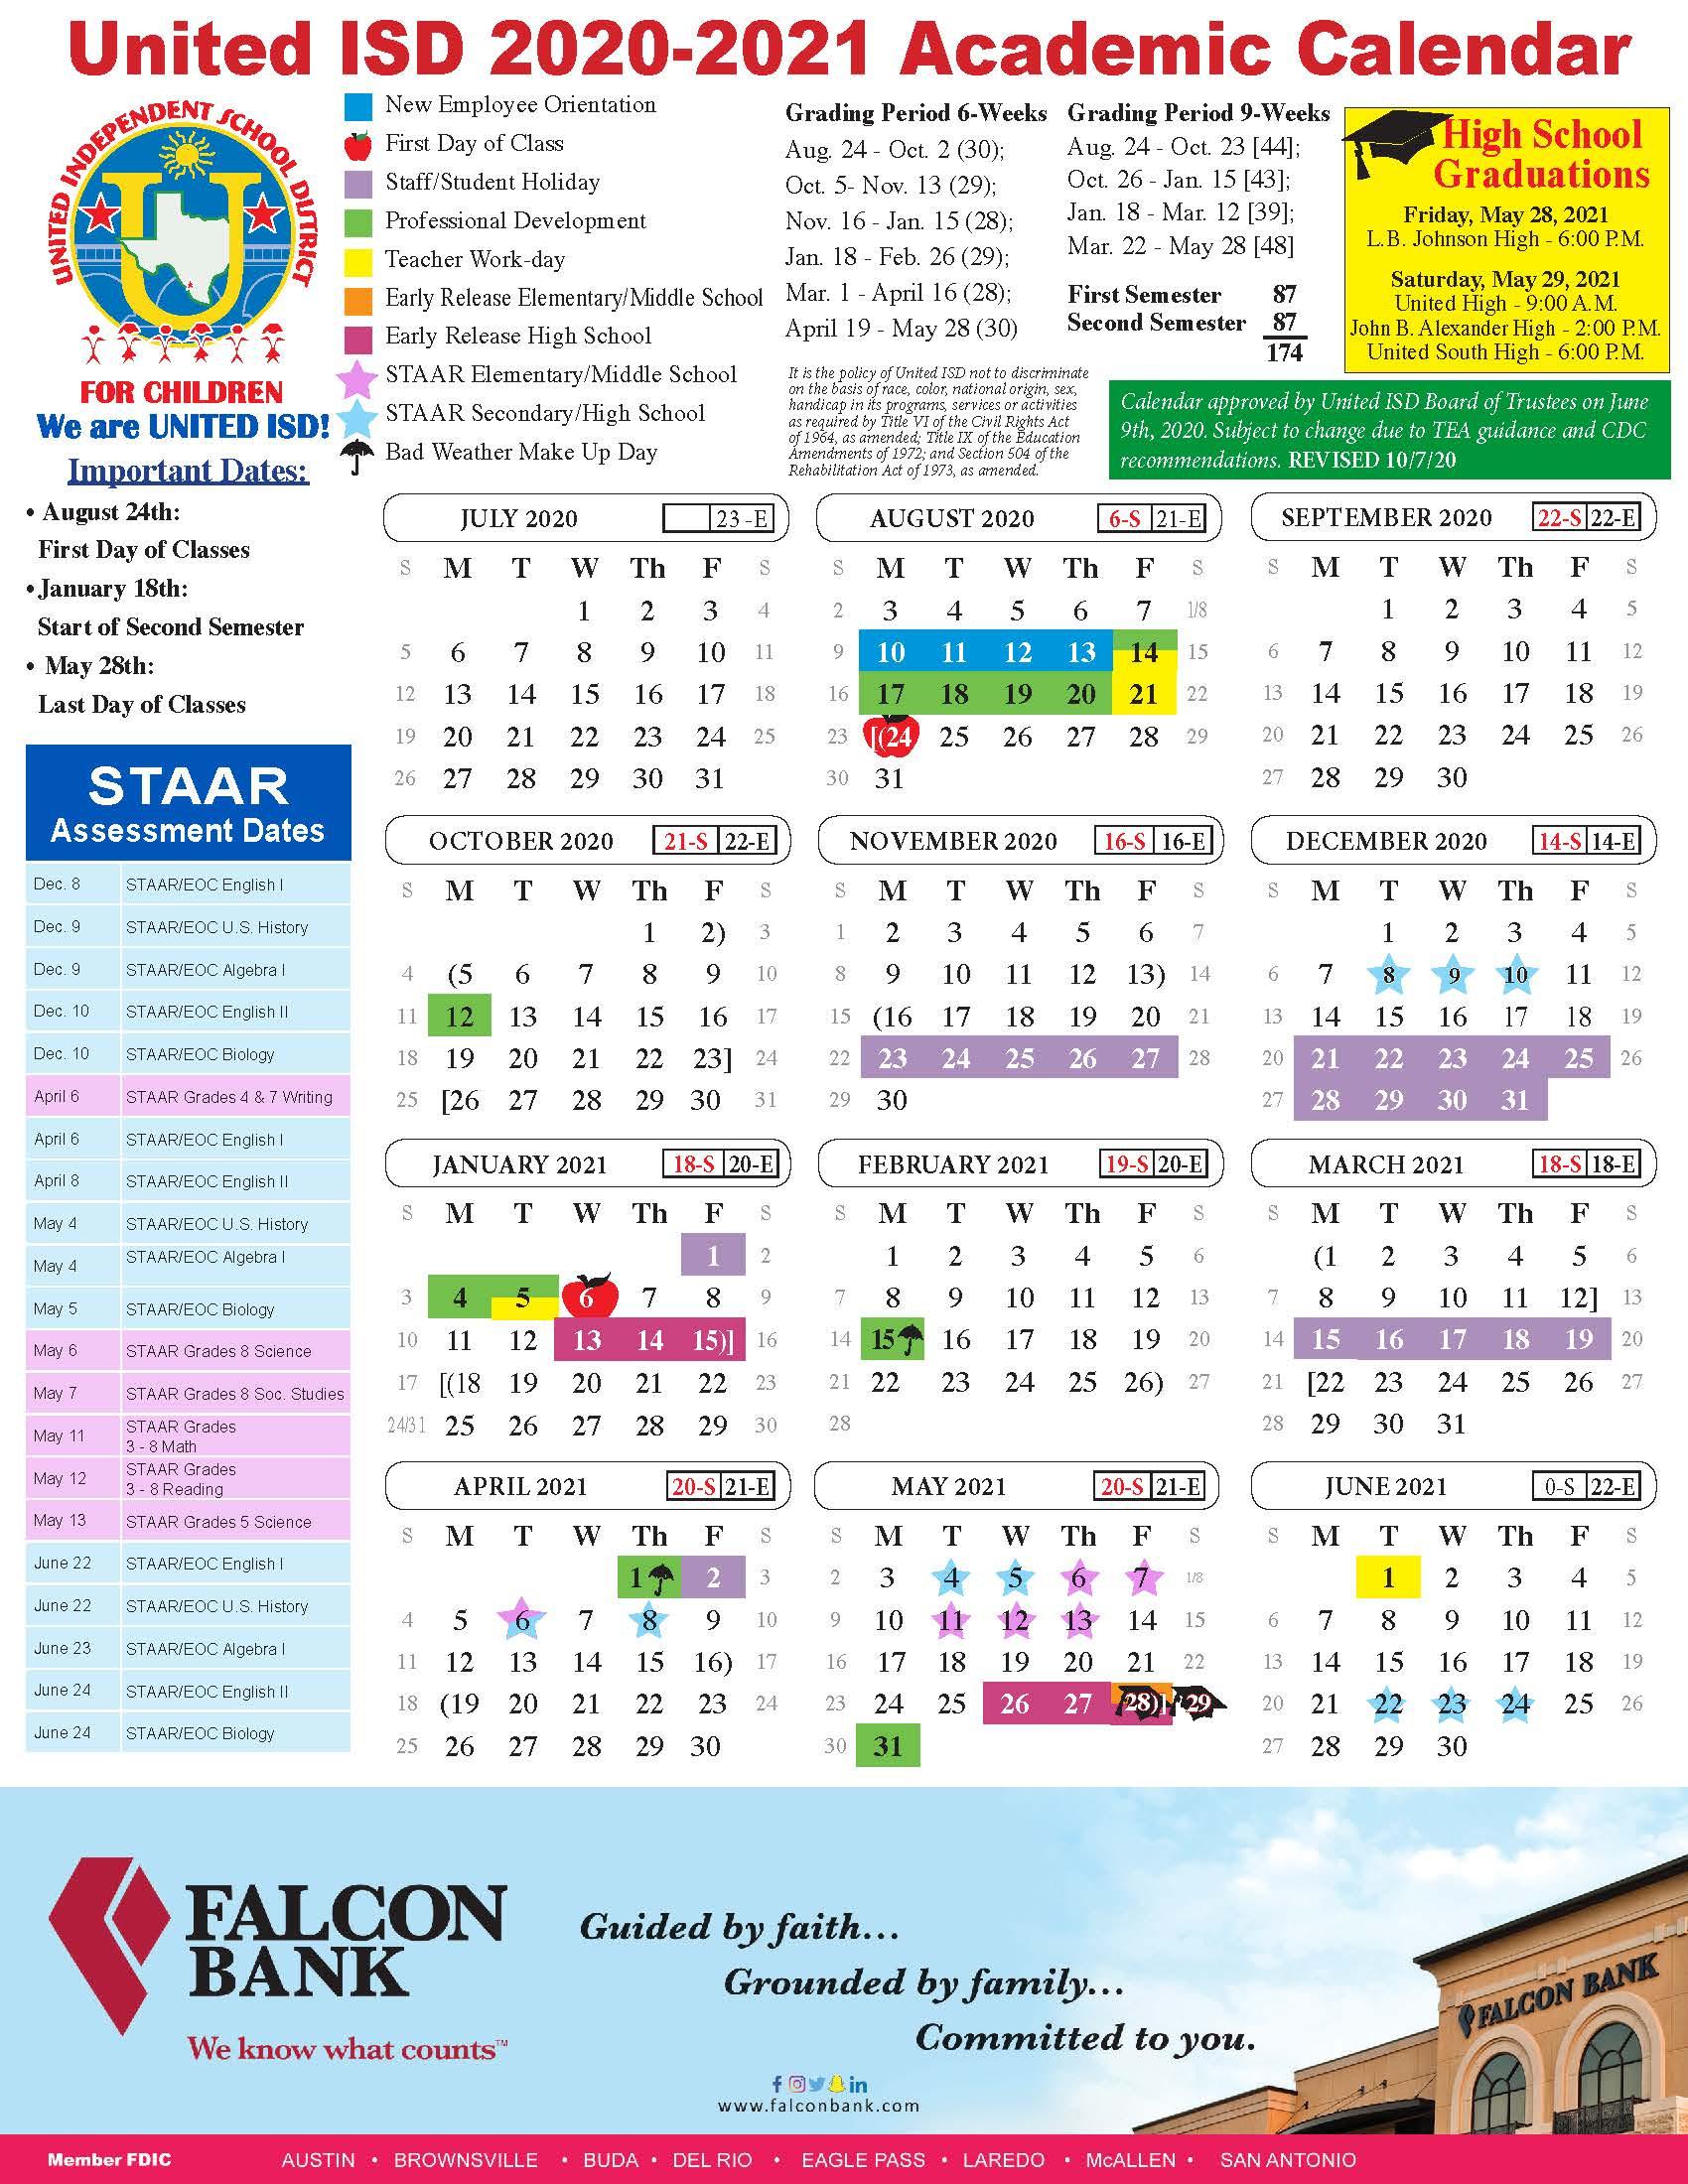 United Isd - Academic Calendar